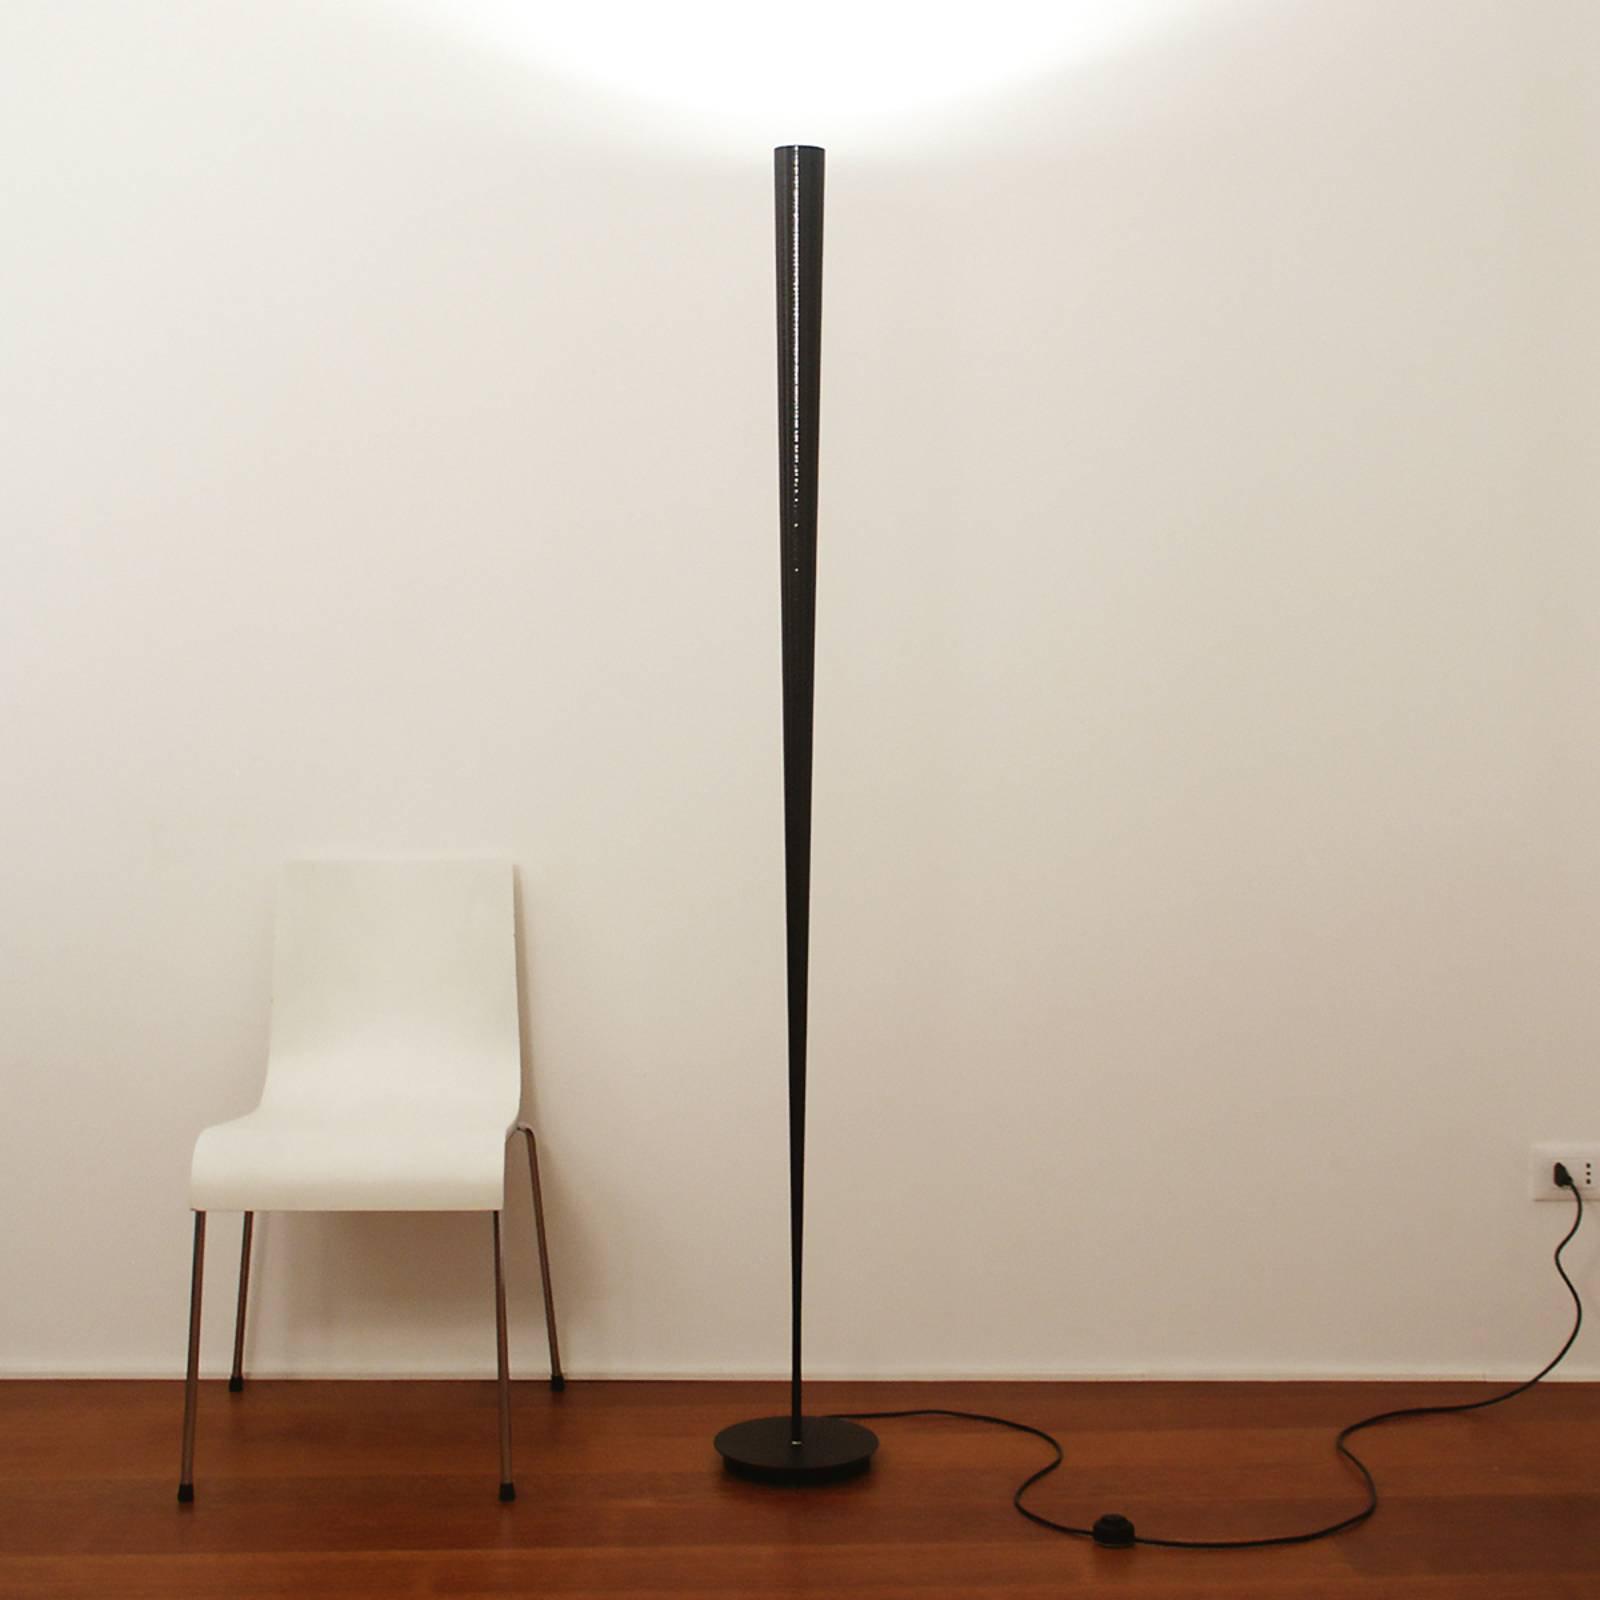 Designer-gulvlampe Drink, svart